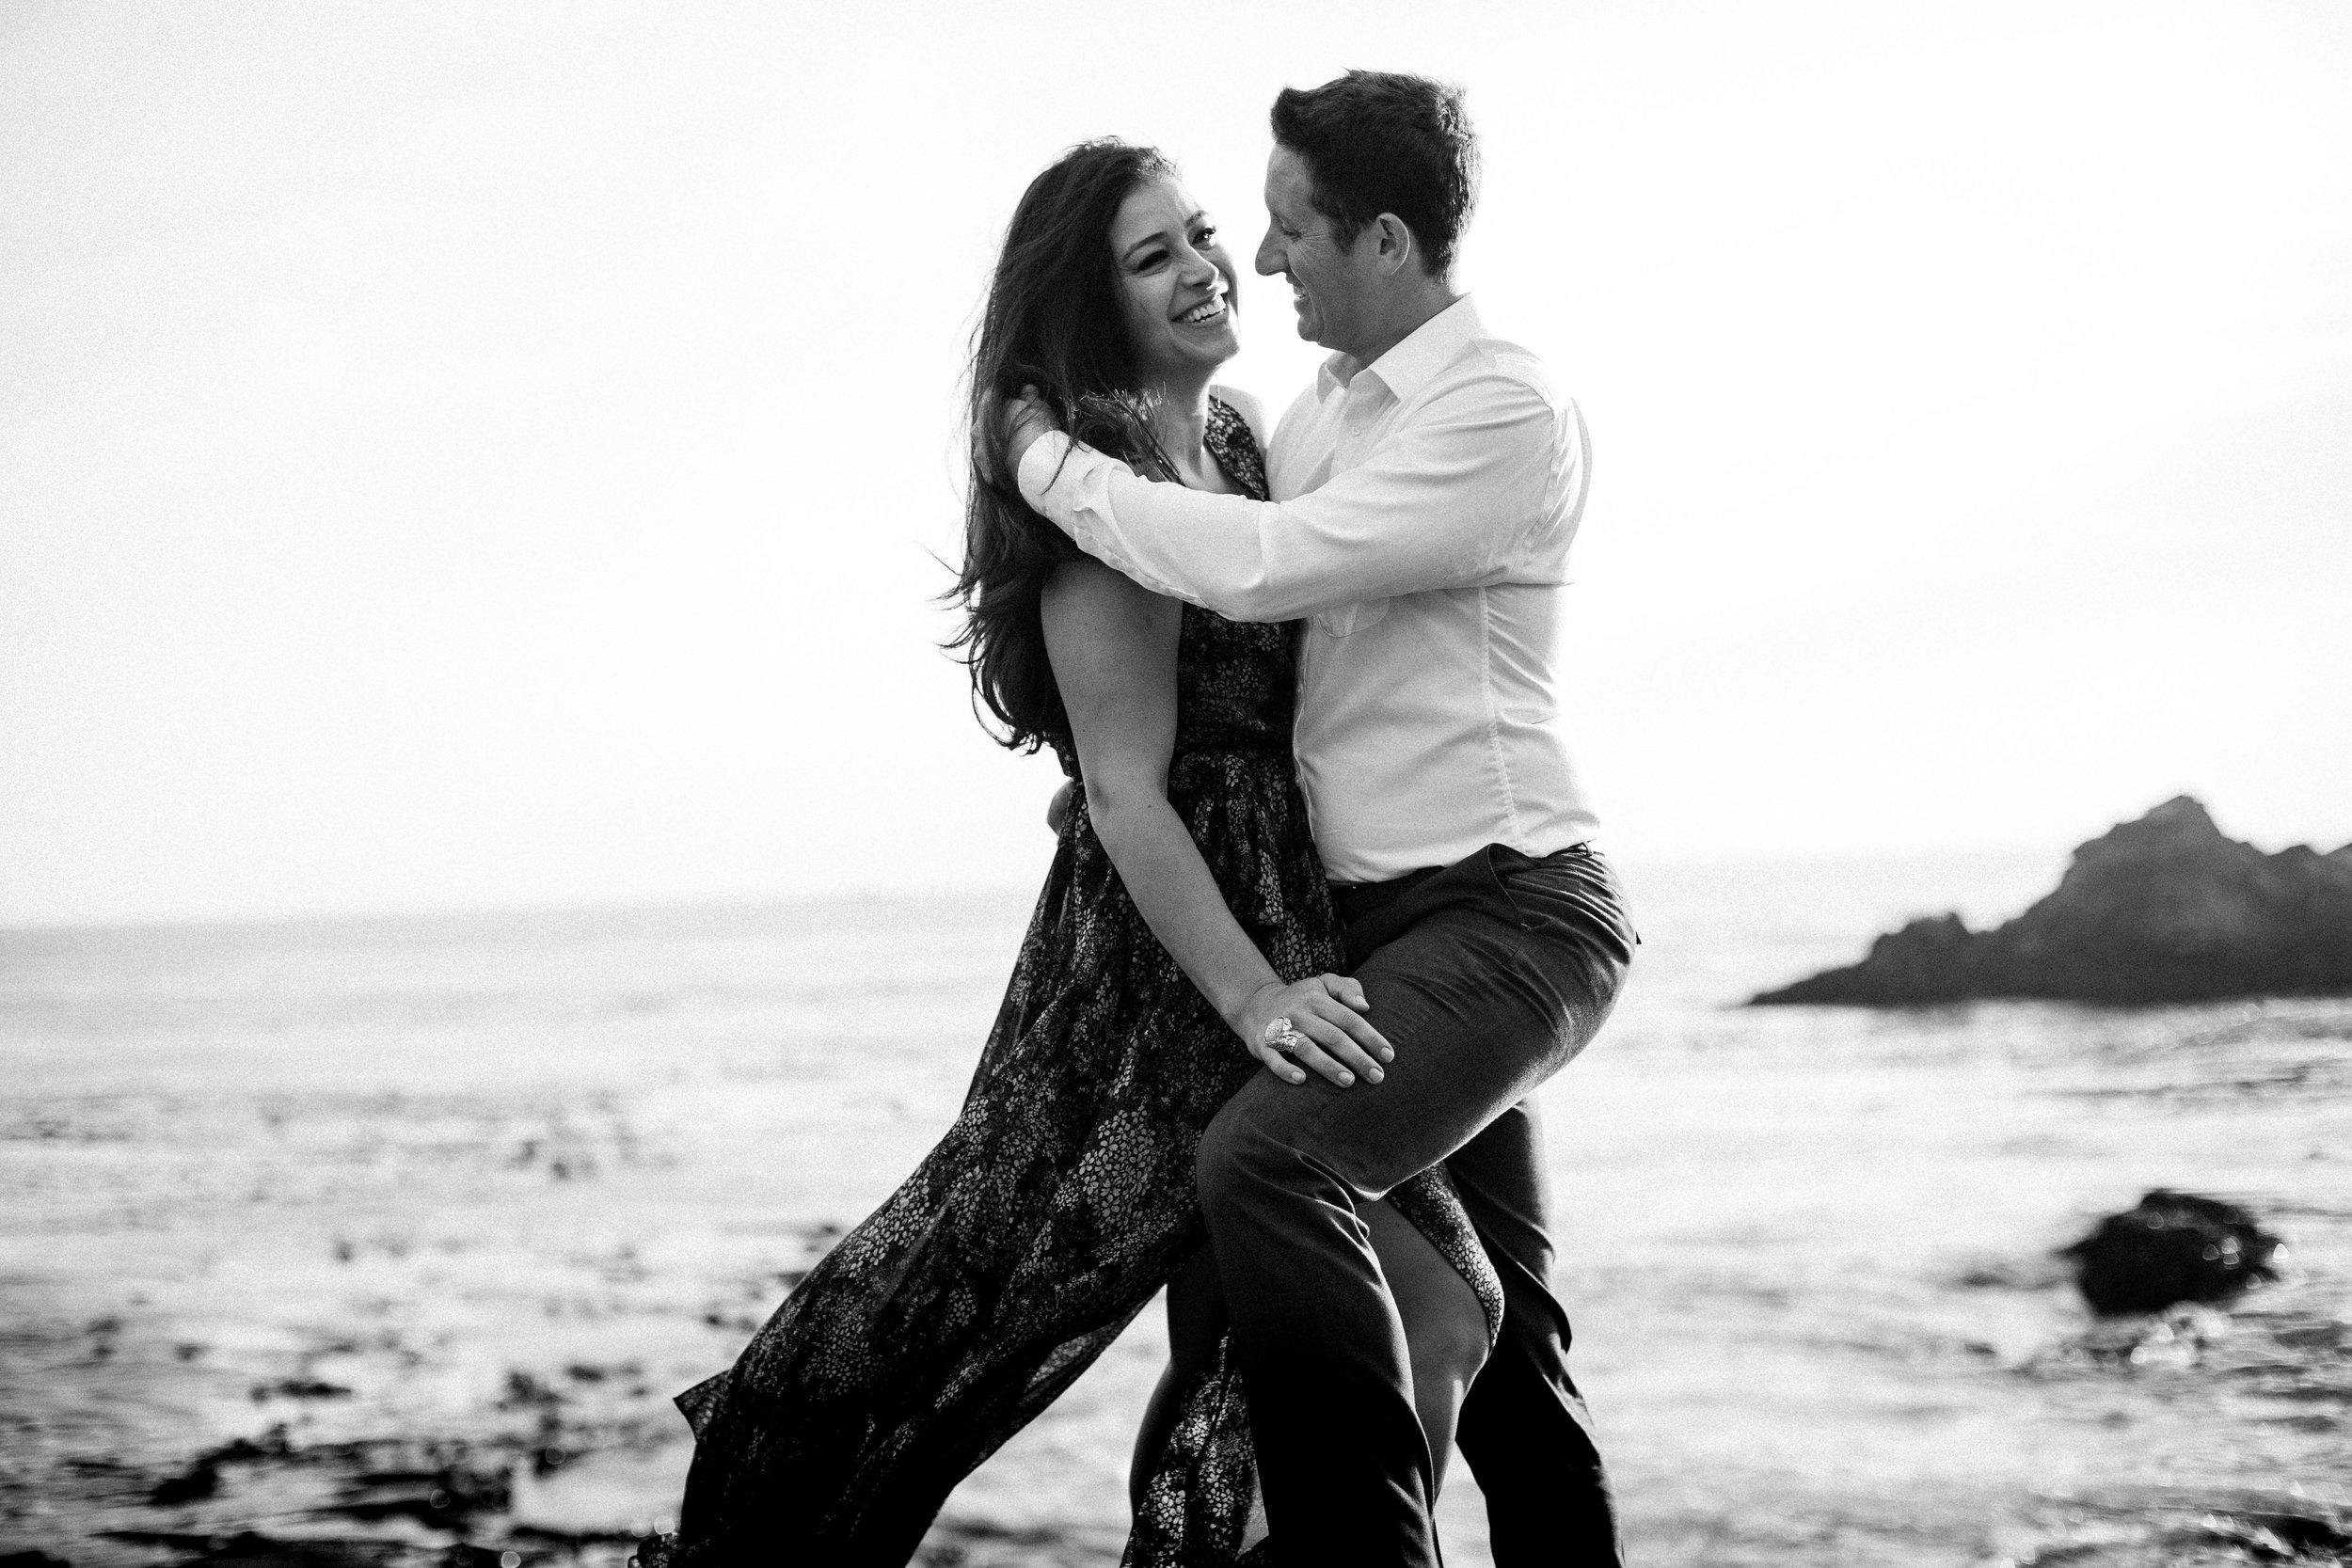 nicole-daacke-photography-big-sur-california-coast-adventure-engagement-photos-adventurous-elopement-intimate-wedding-photographer-golden-coastal-cali-engagement-session-9.jpg